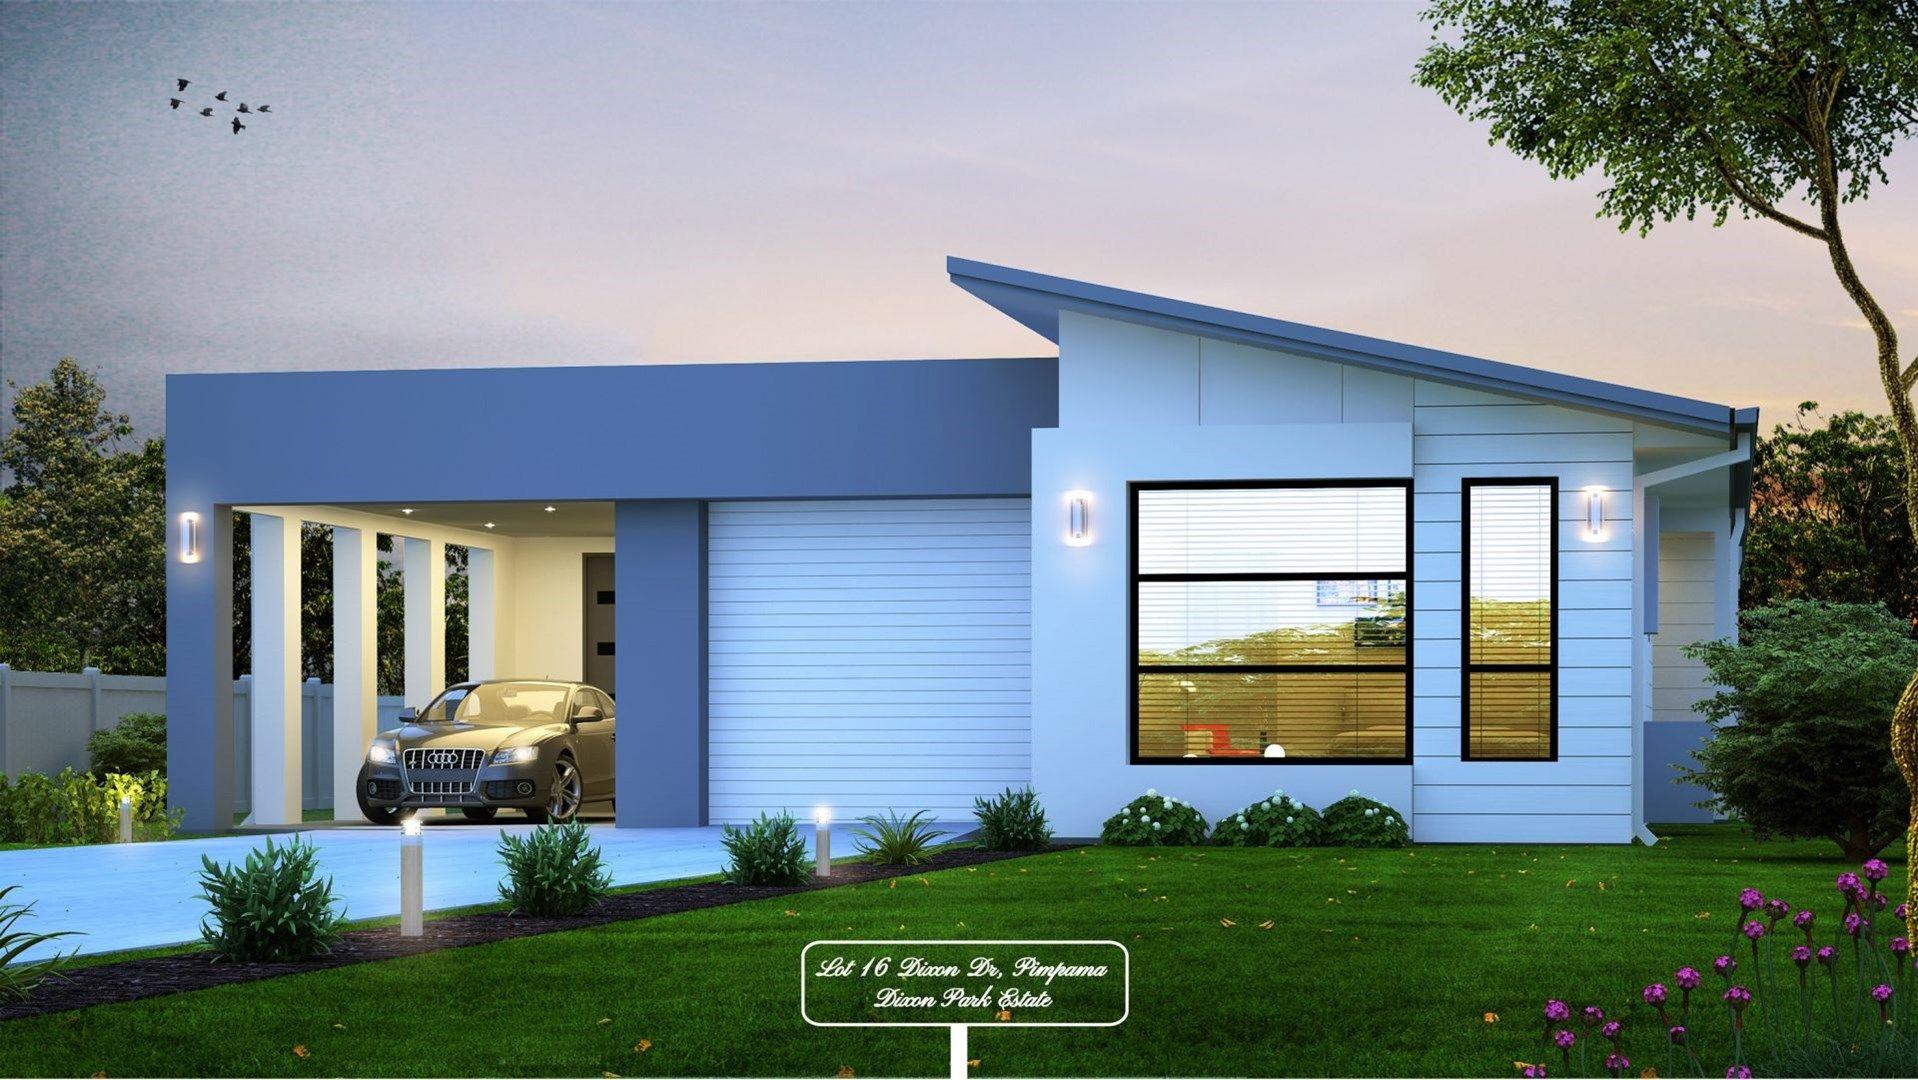 Lot 16 Dixon Drive, Pimpama QLD 4209, Image 0